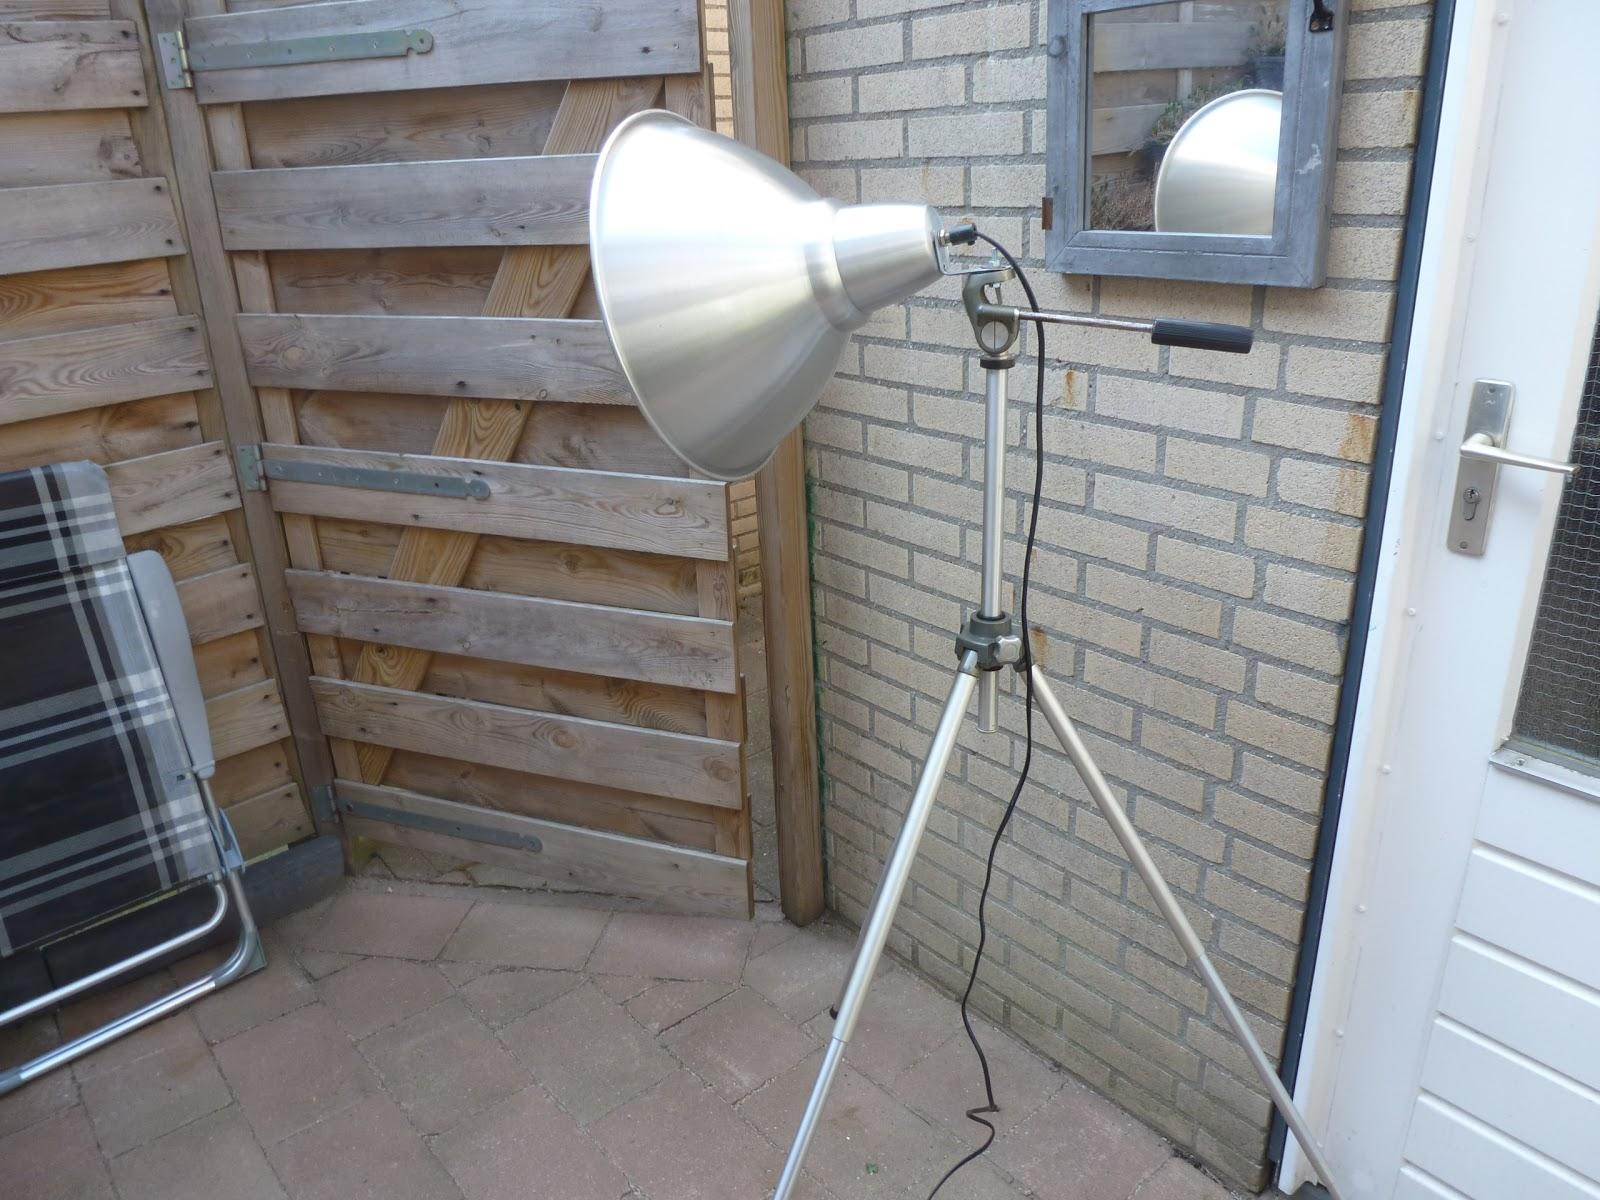 Staande lamp stoer cool with staande lamp stoer great